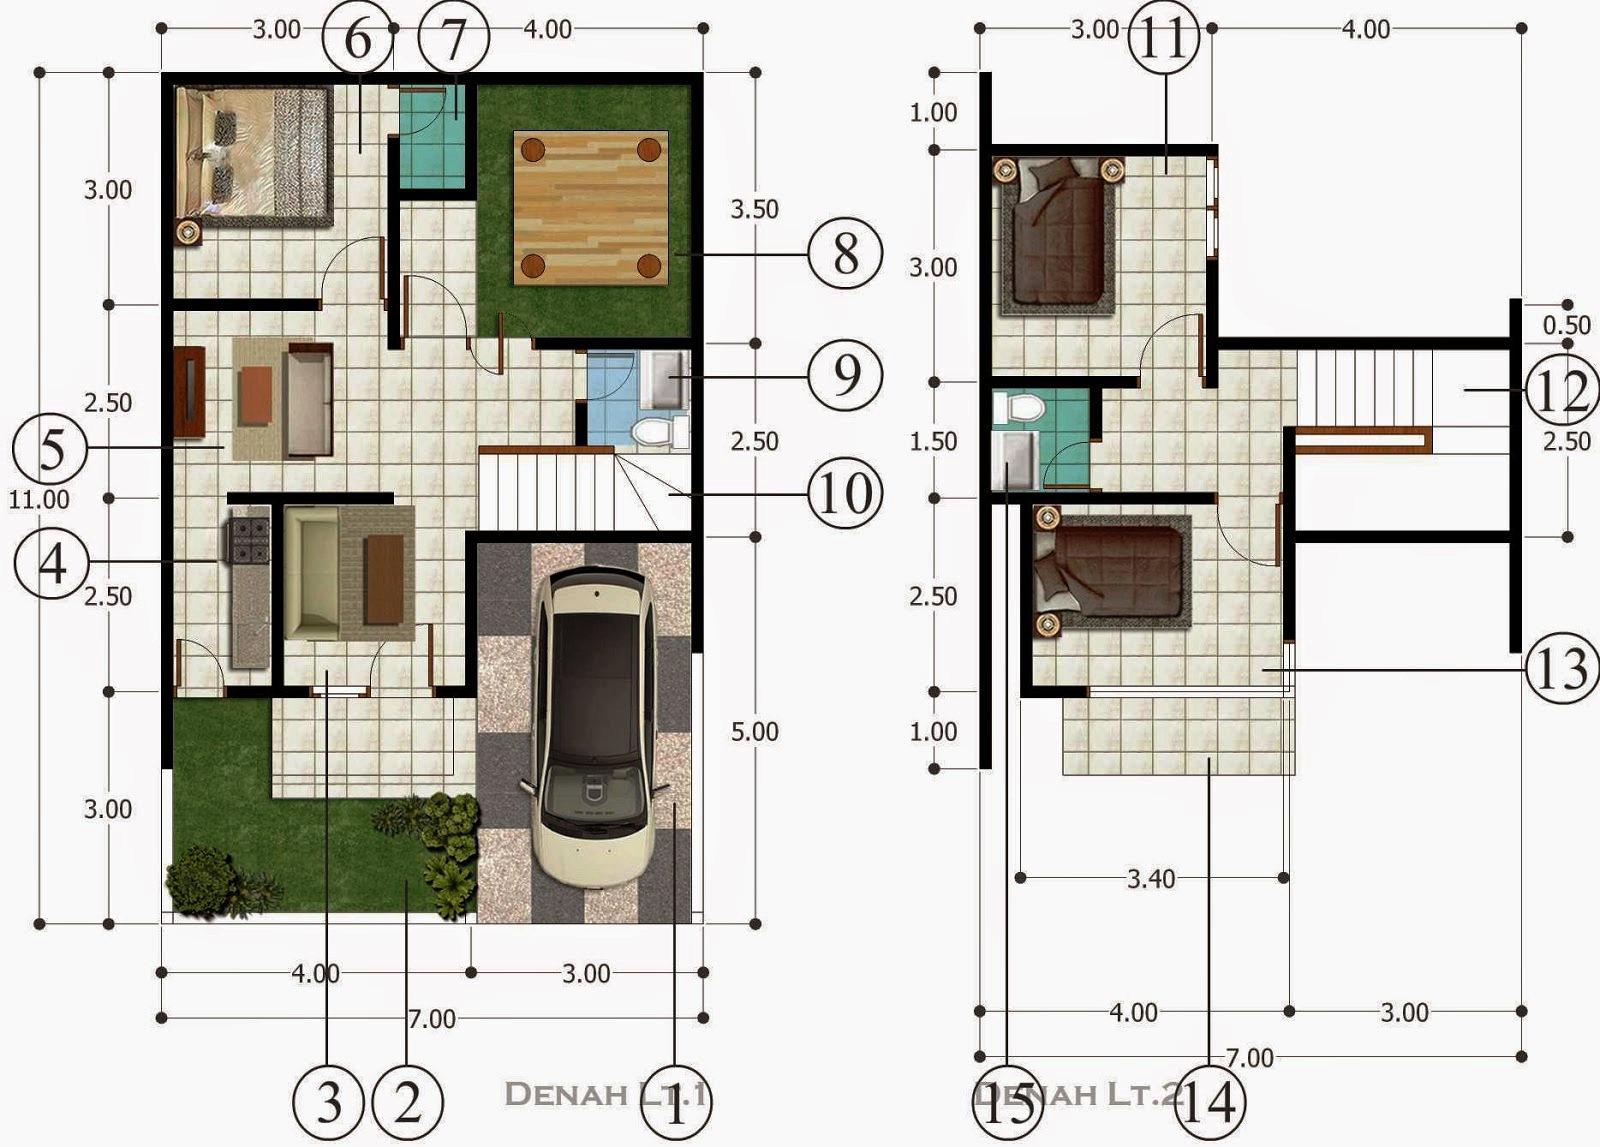 Denah Rumah 2 Lantai Type 70 Minimalis